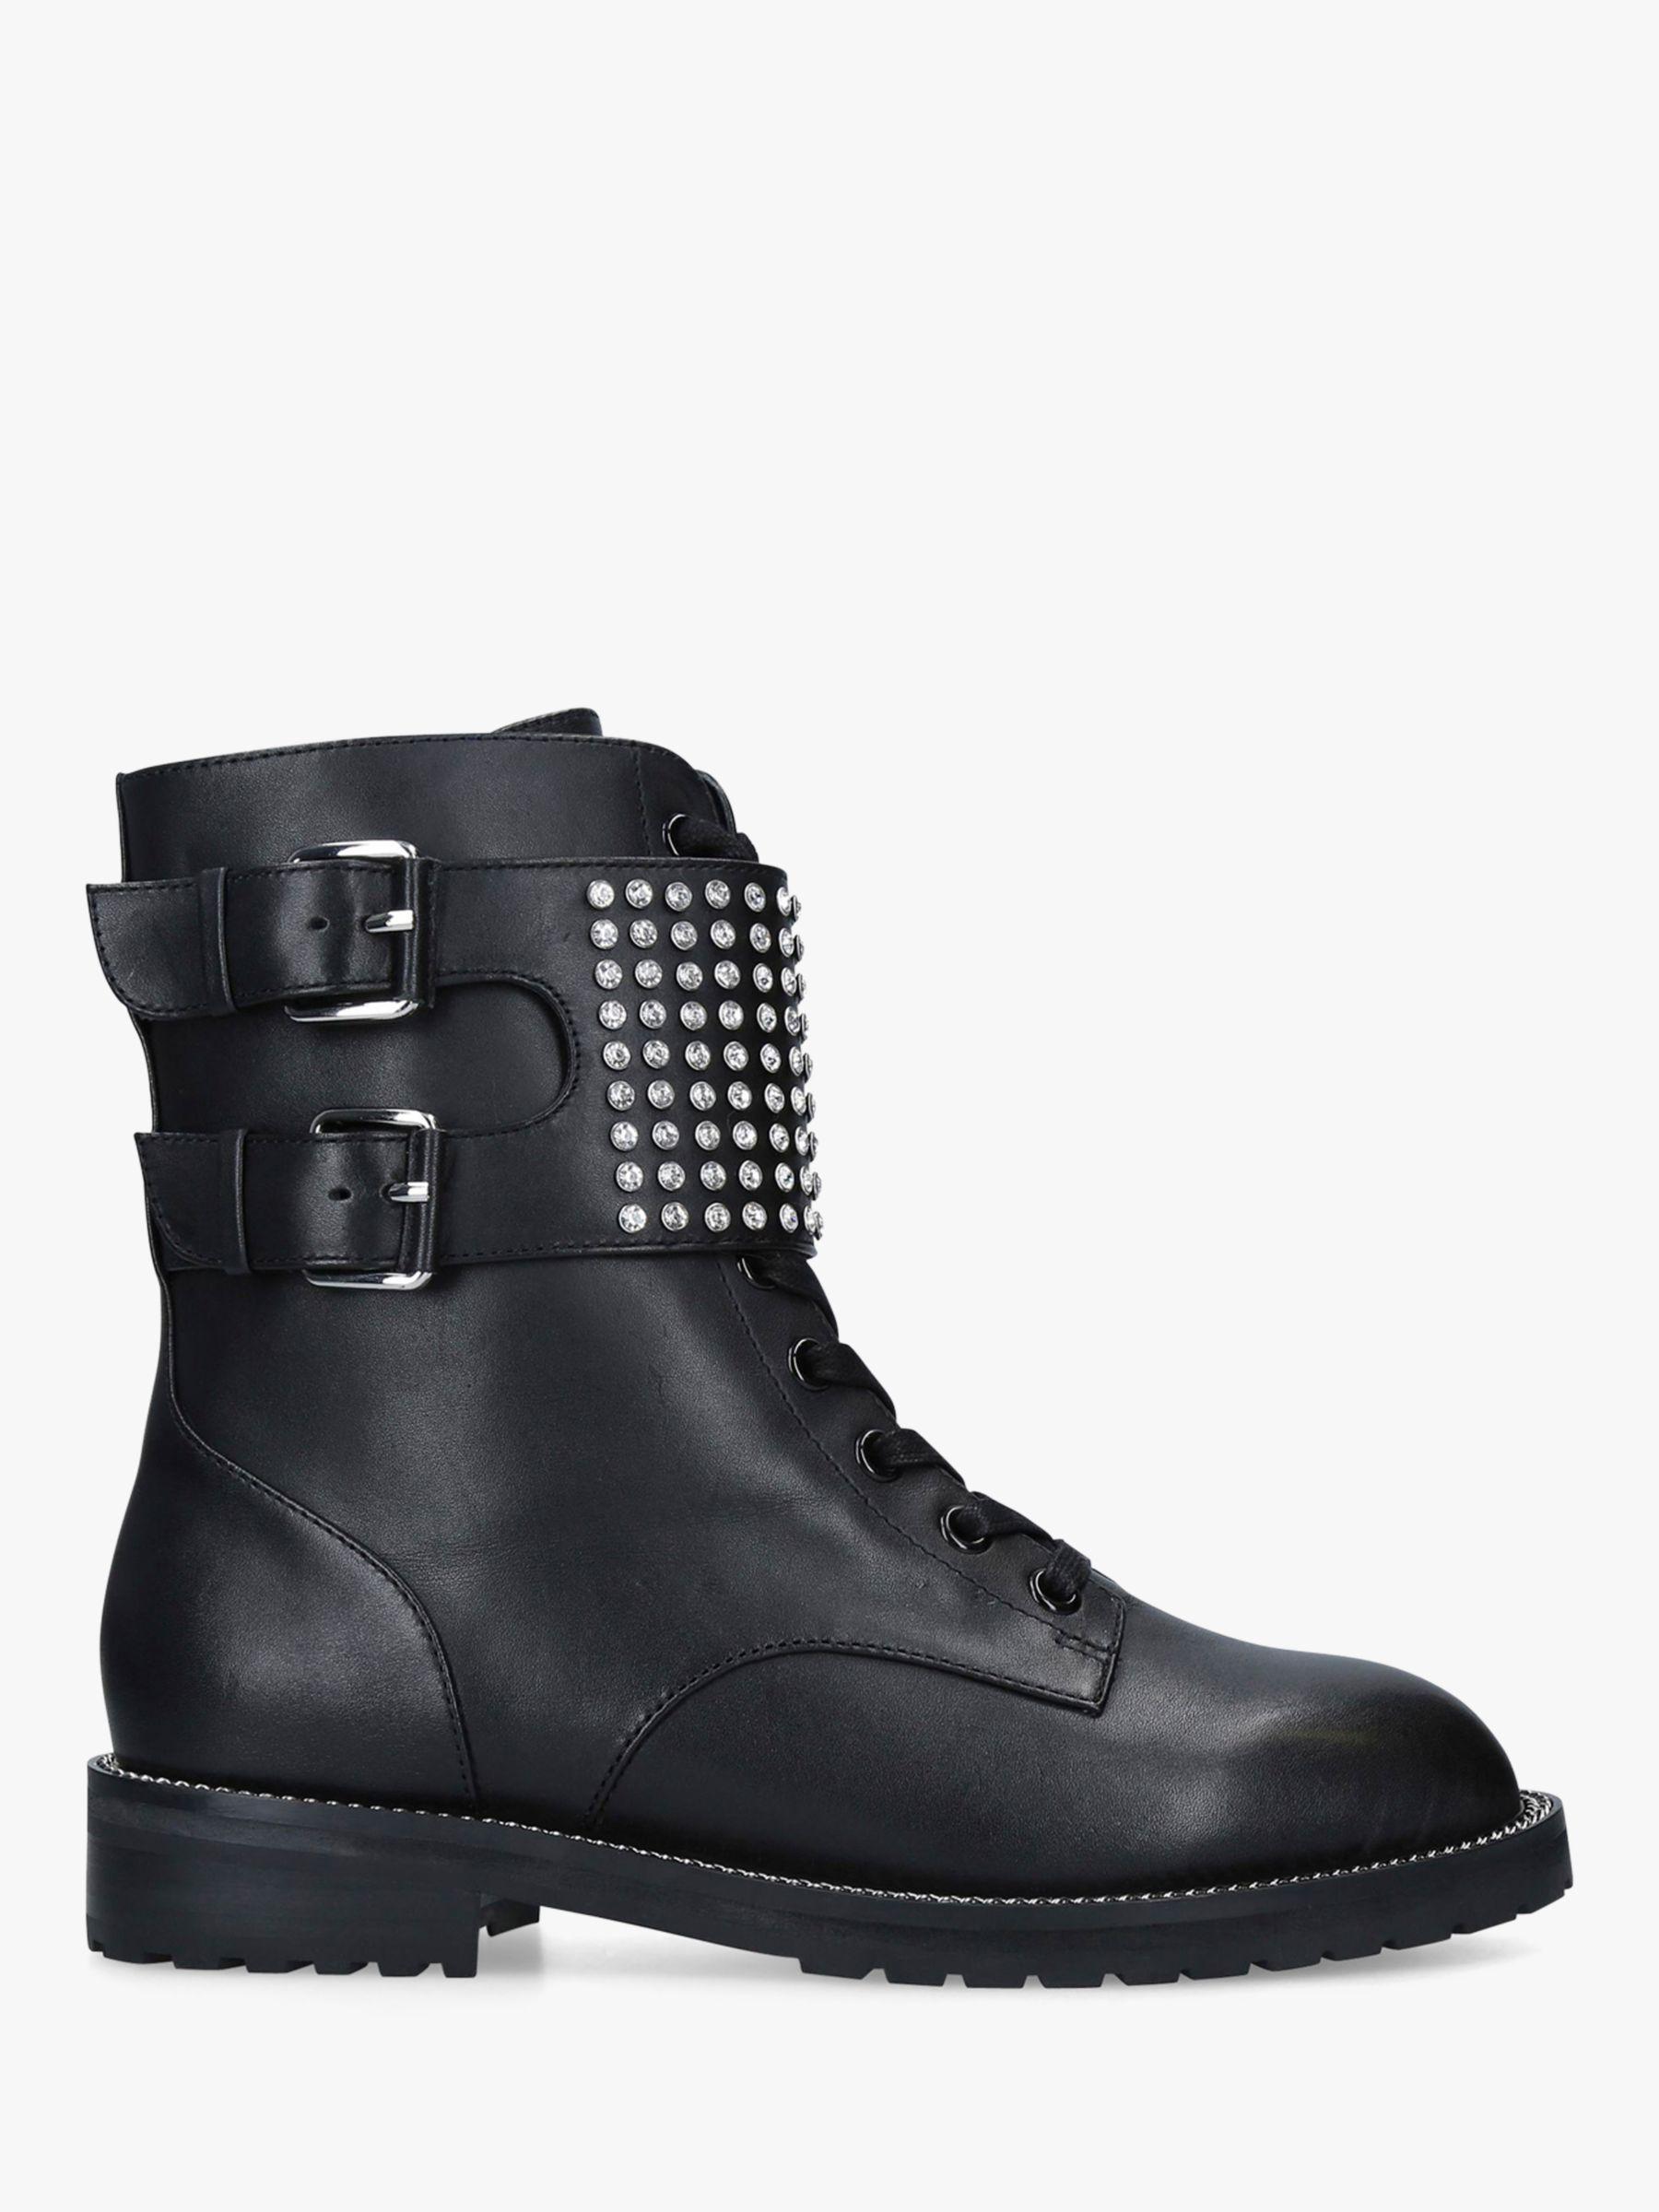 Kurt Geiger London Seth Leather Ankle Boots, Black